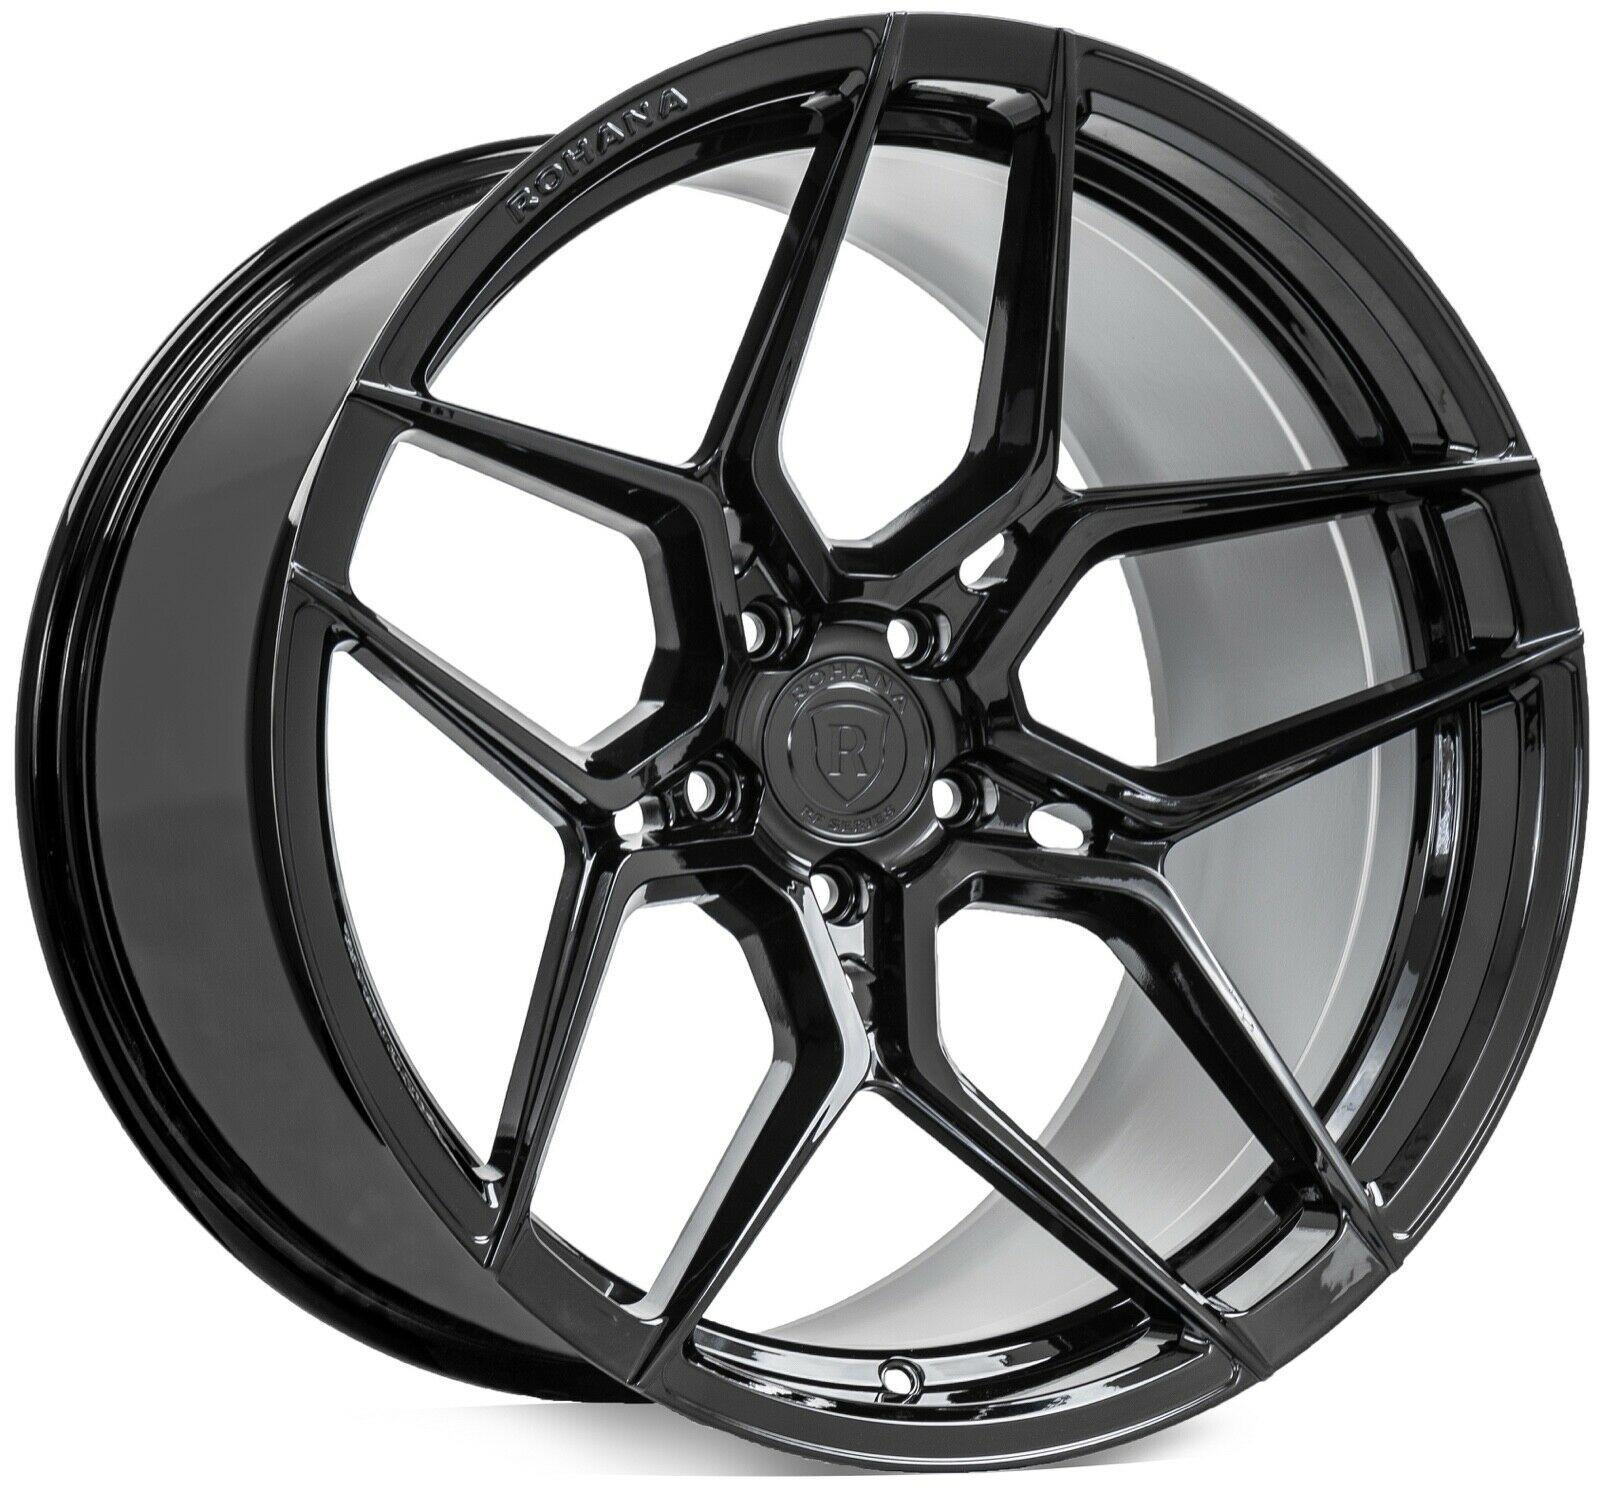 Audi R8 Rims Audi R8 Audi Q7 Black Rims